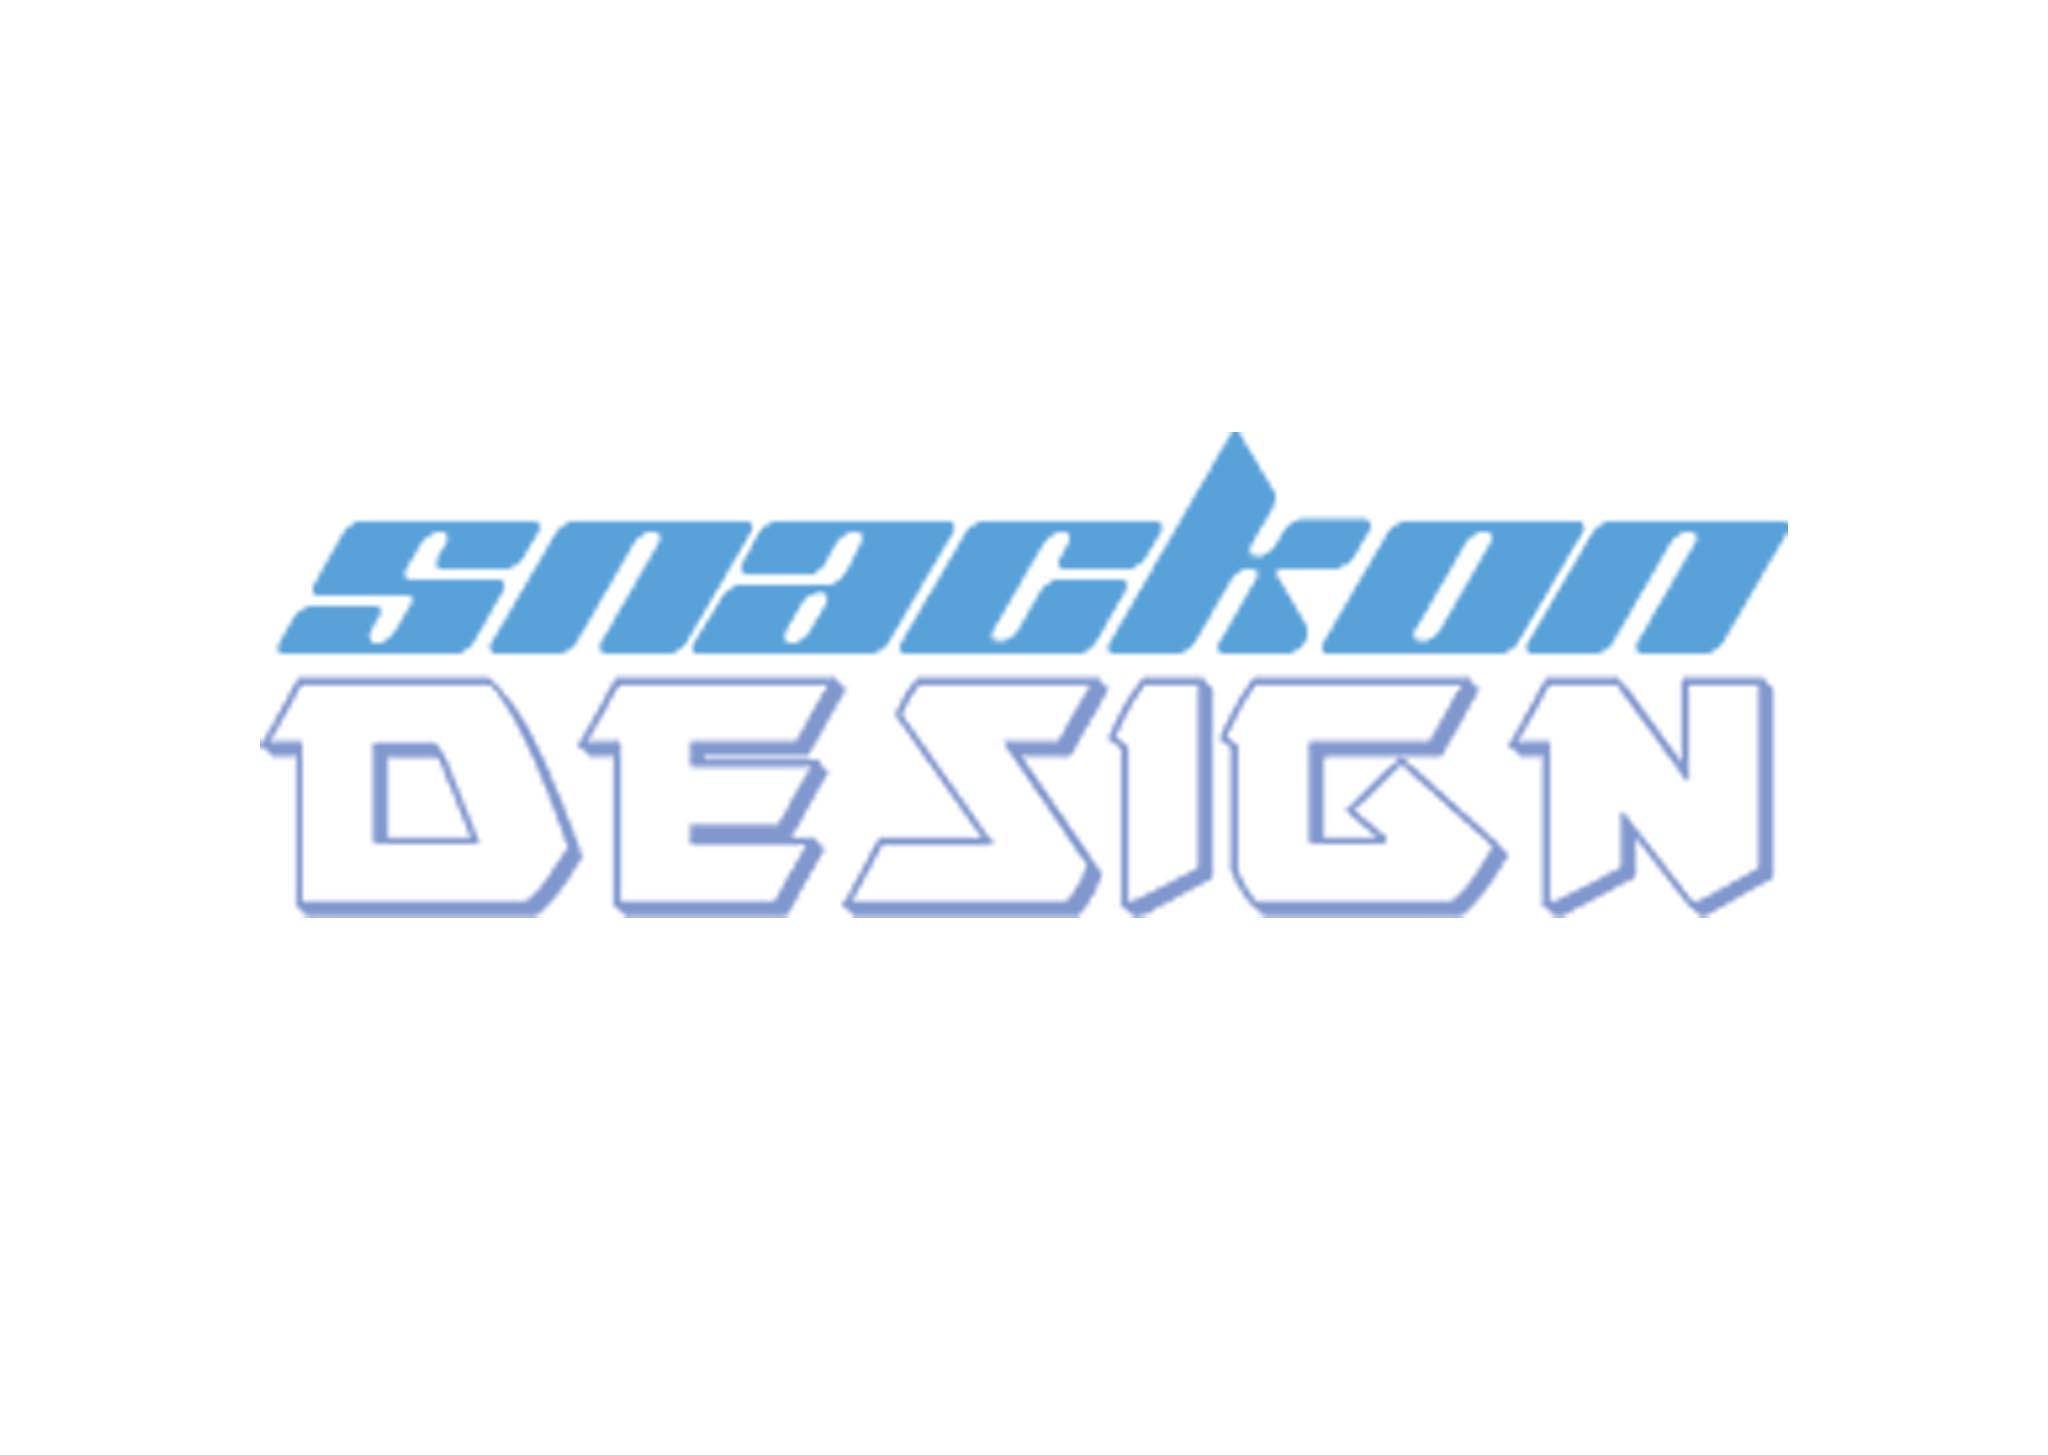 https://www.snackondesign.com/wp-content/uploads/2018/06/SnackON-Design.jpg